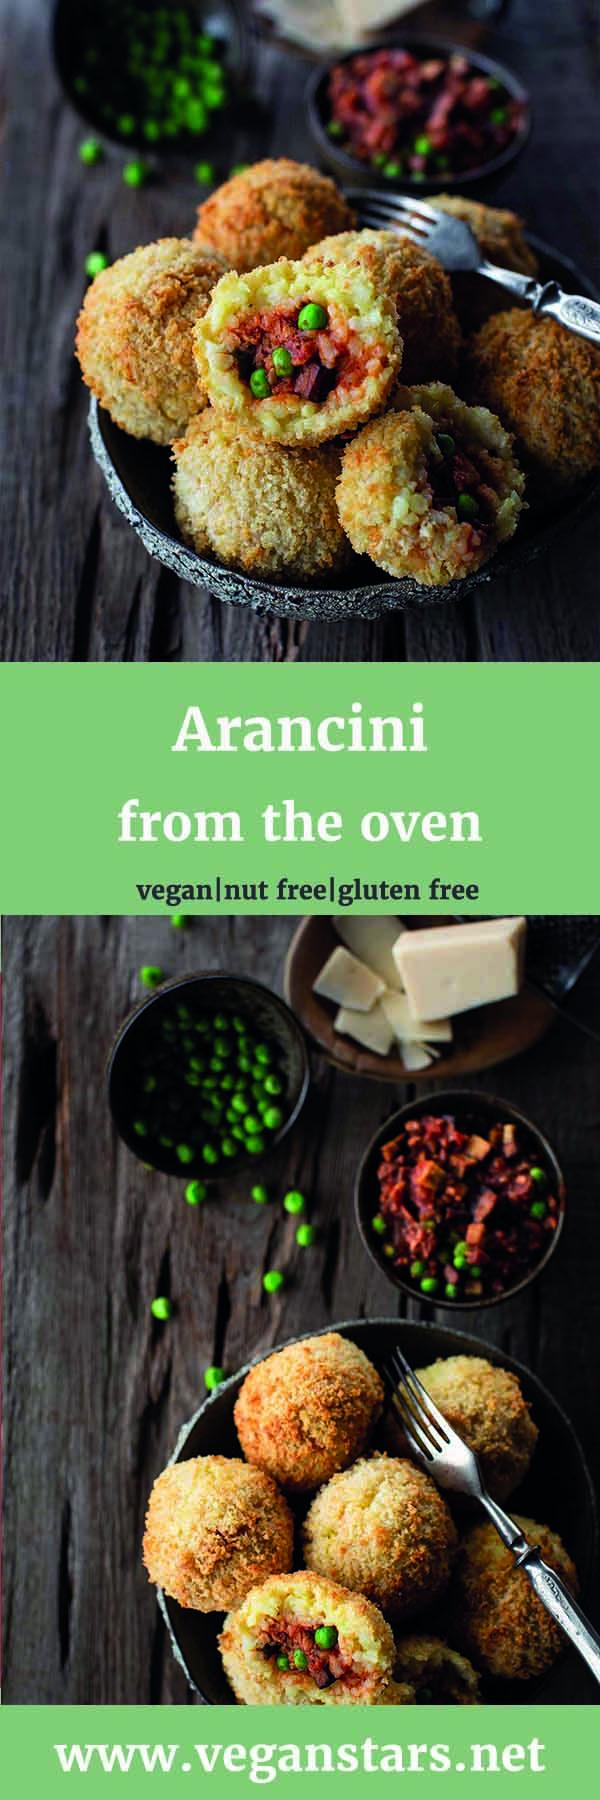 Arancini (vegan)